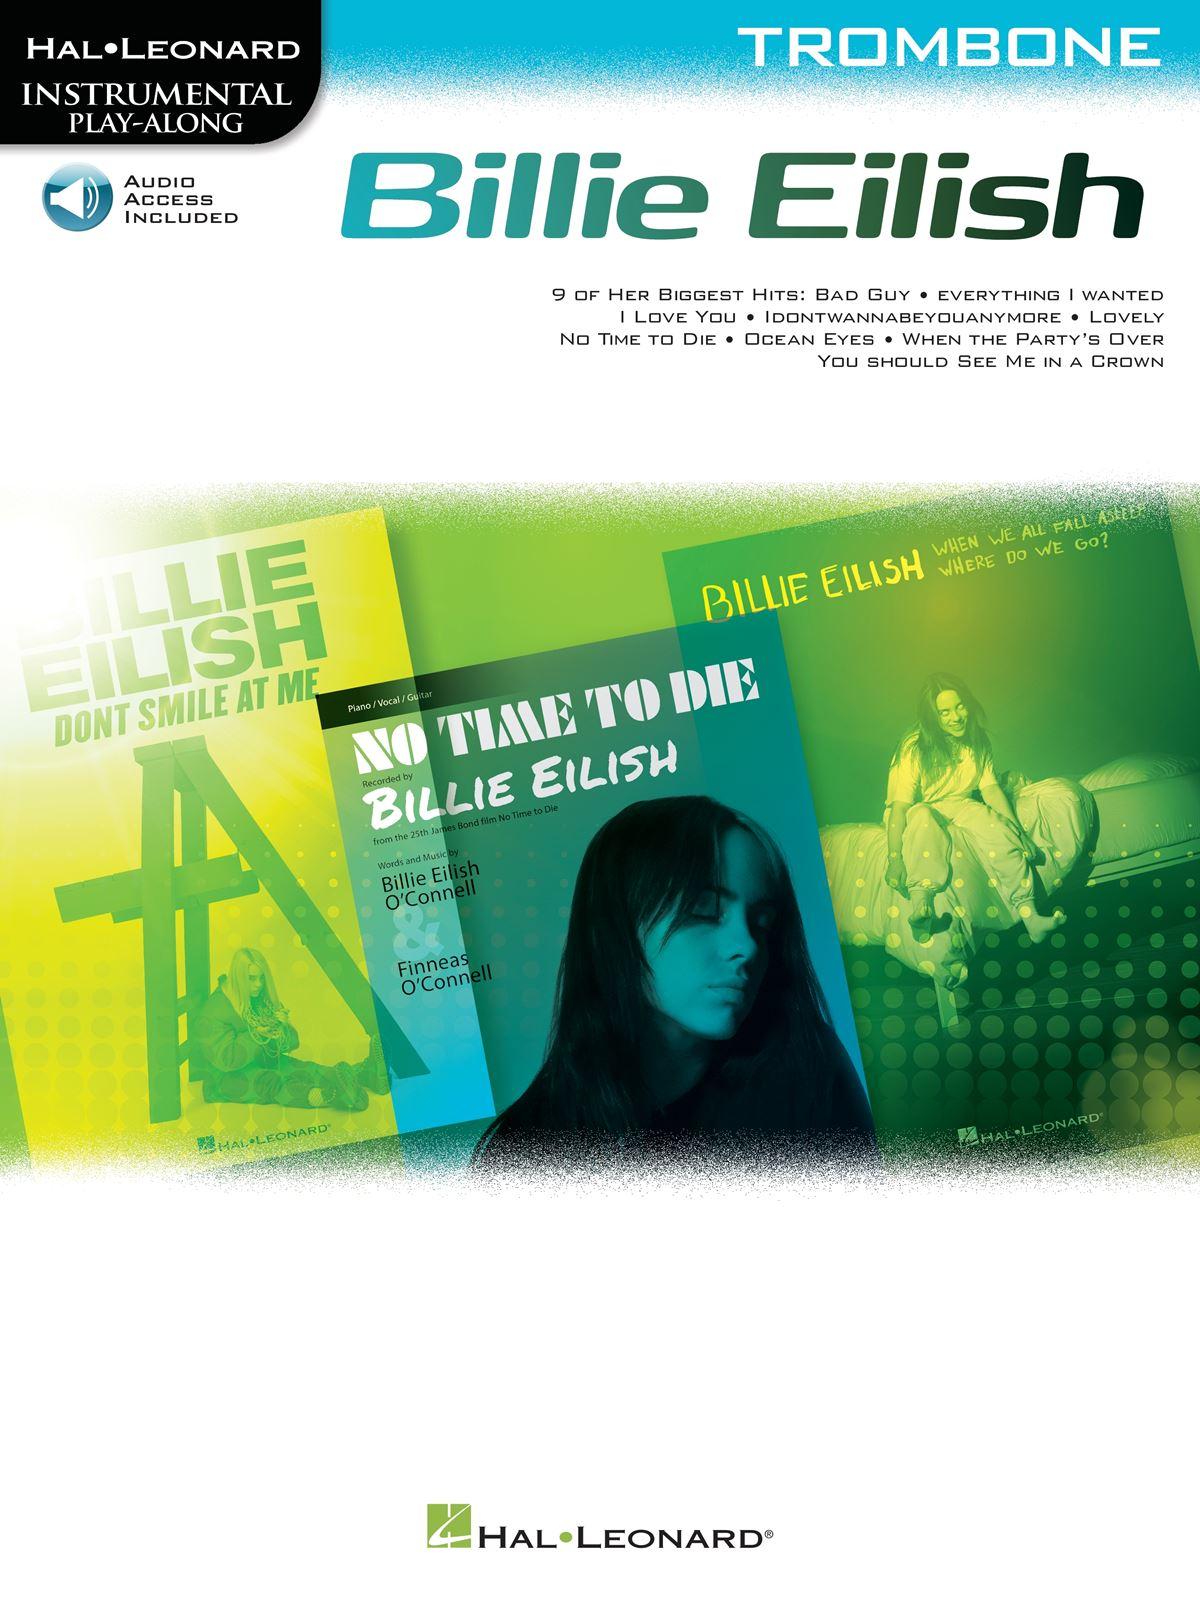 Billie Eilish: Billie Eilish For Trombone: Trombone Solo: Instrumental